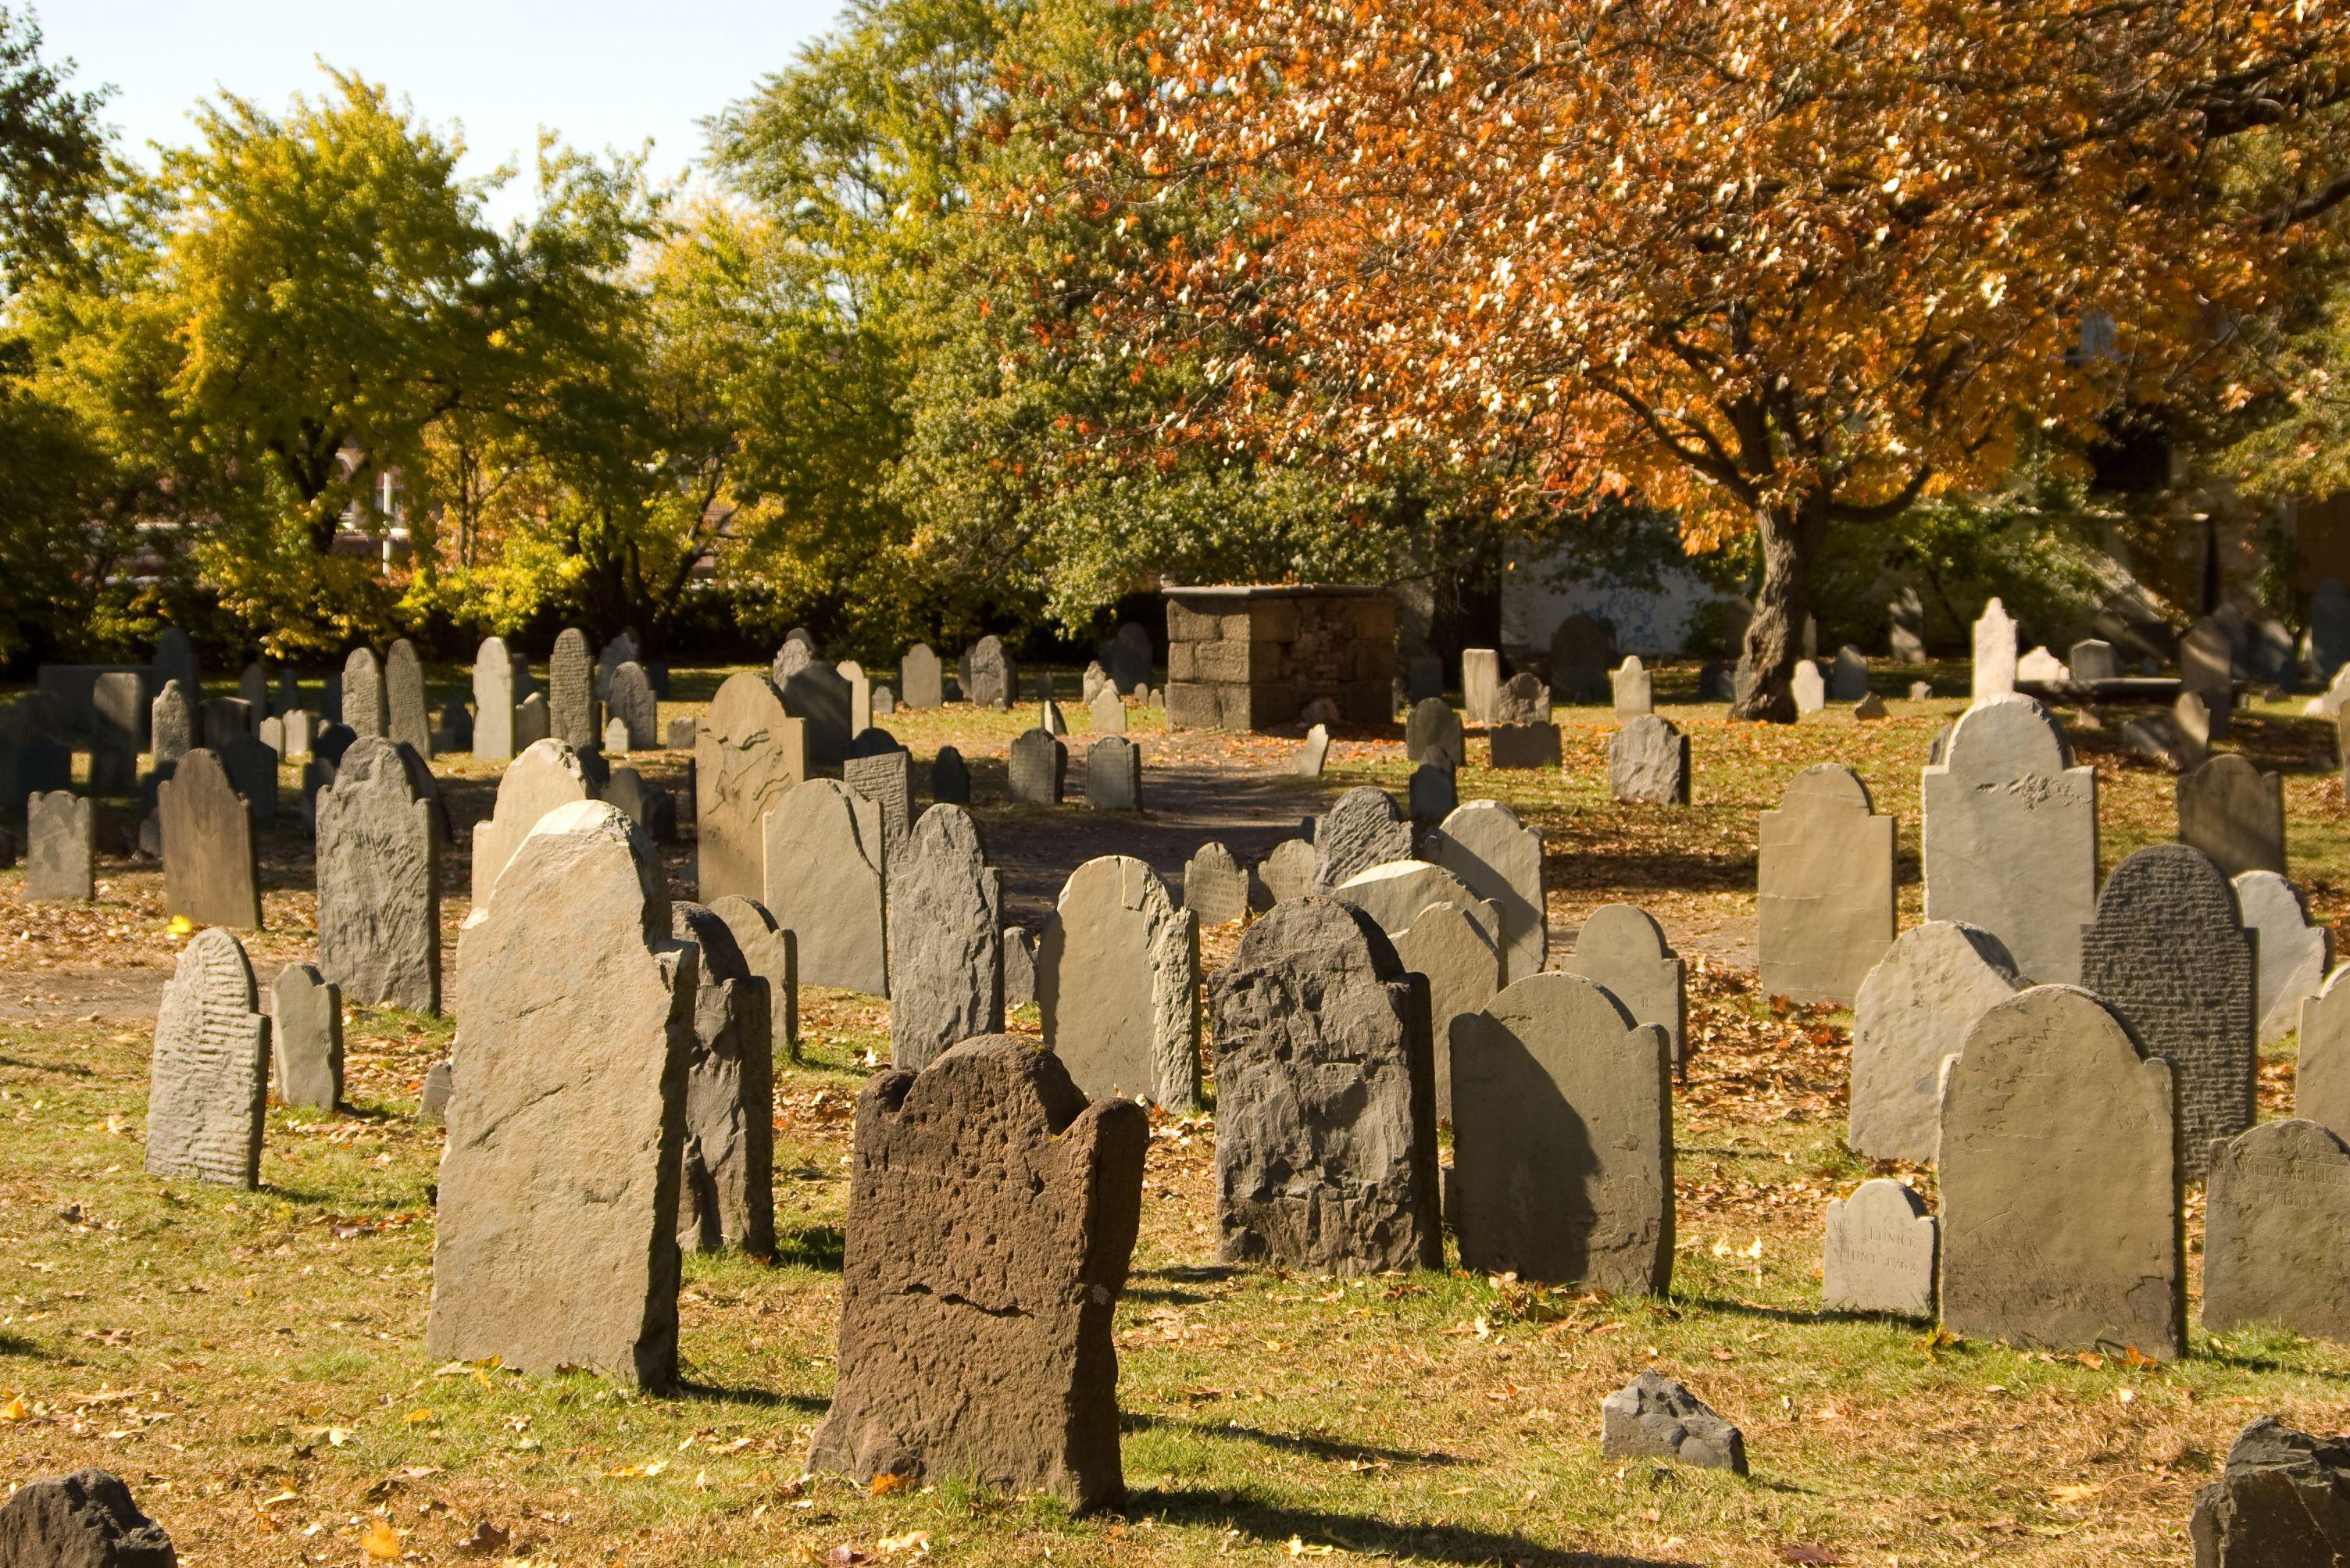 The Burying Point, Salem Massachusetts